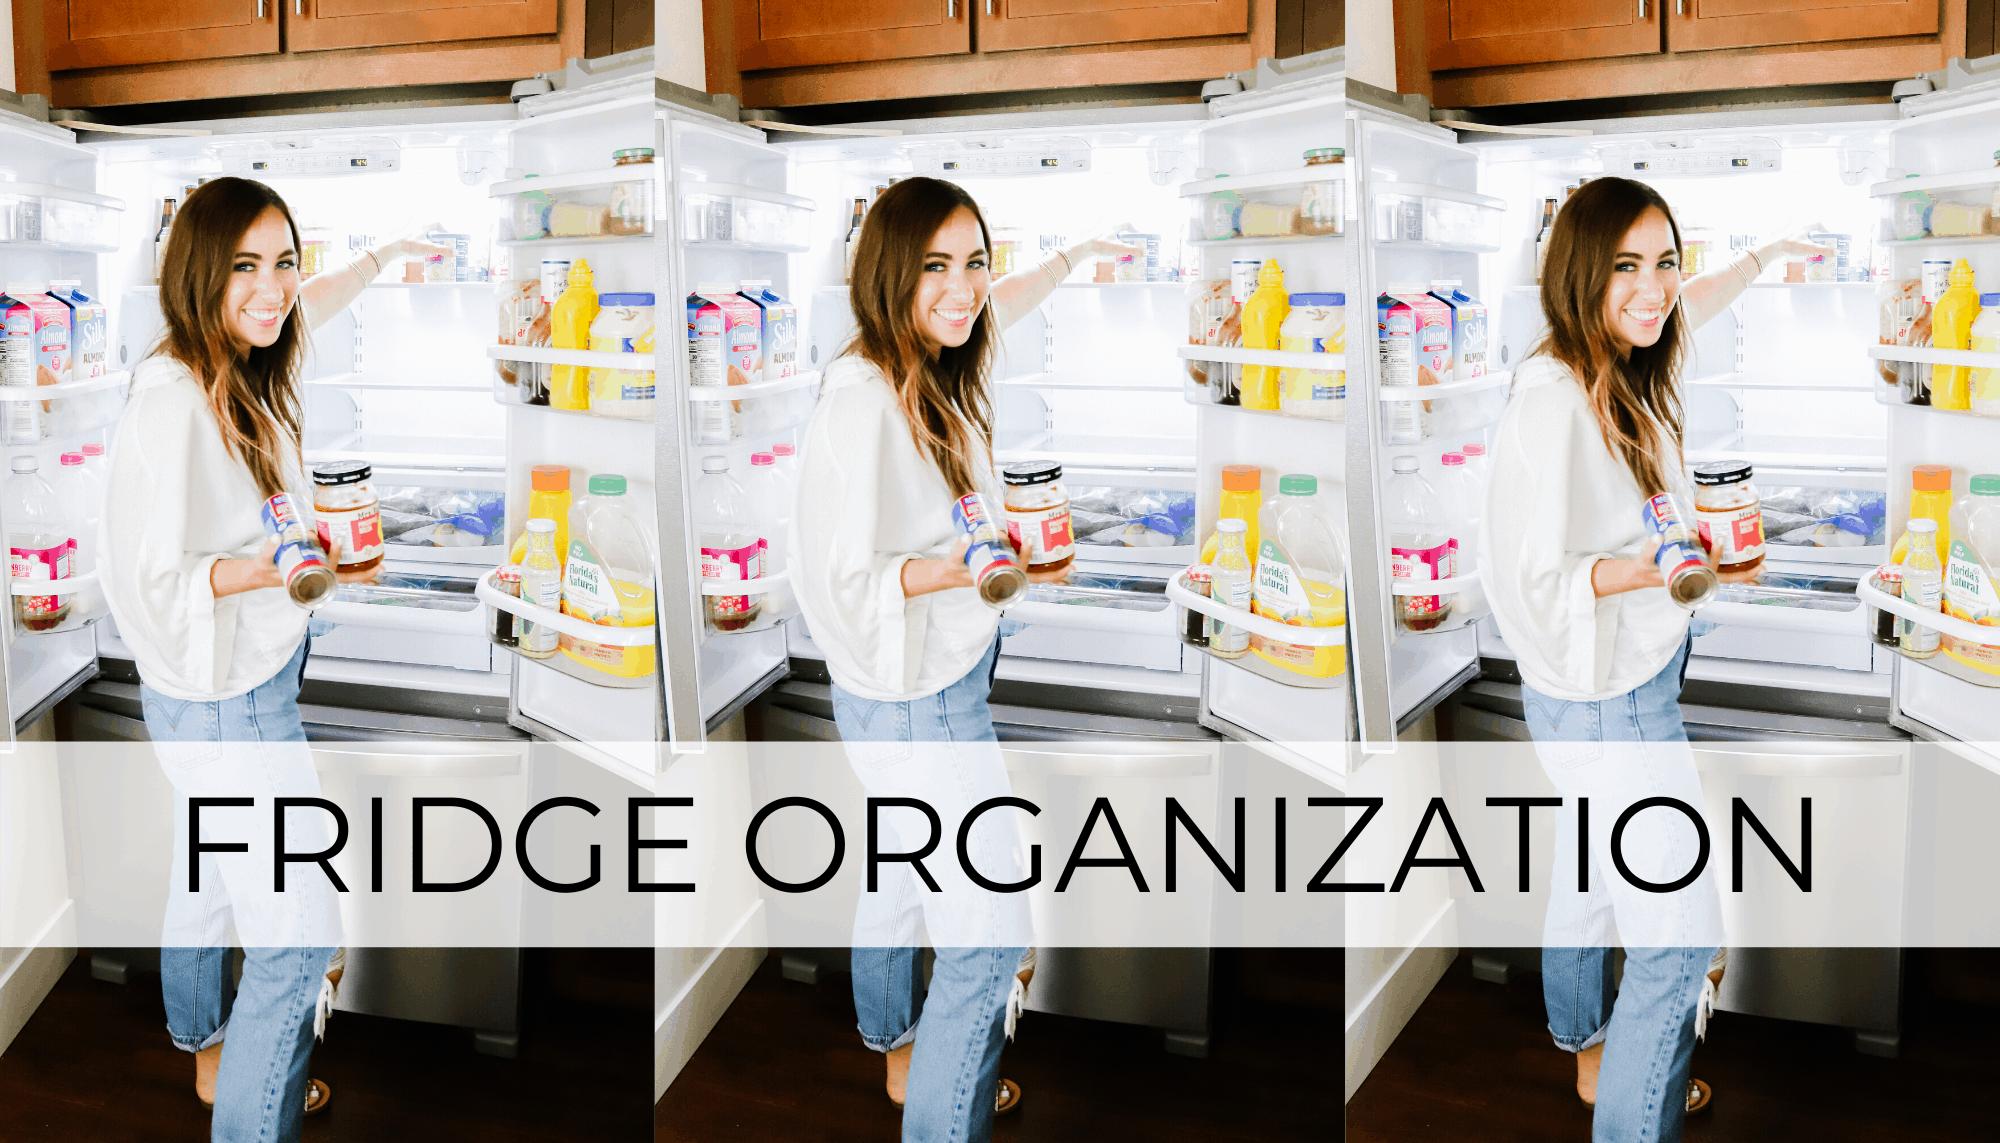 fridge organization